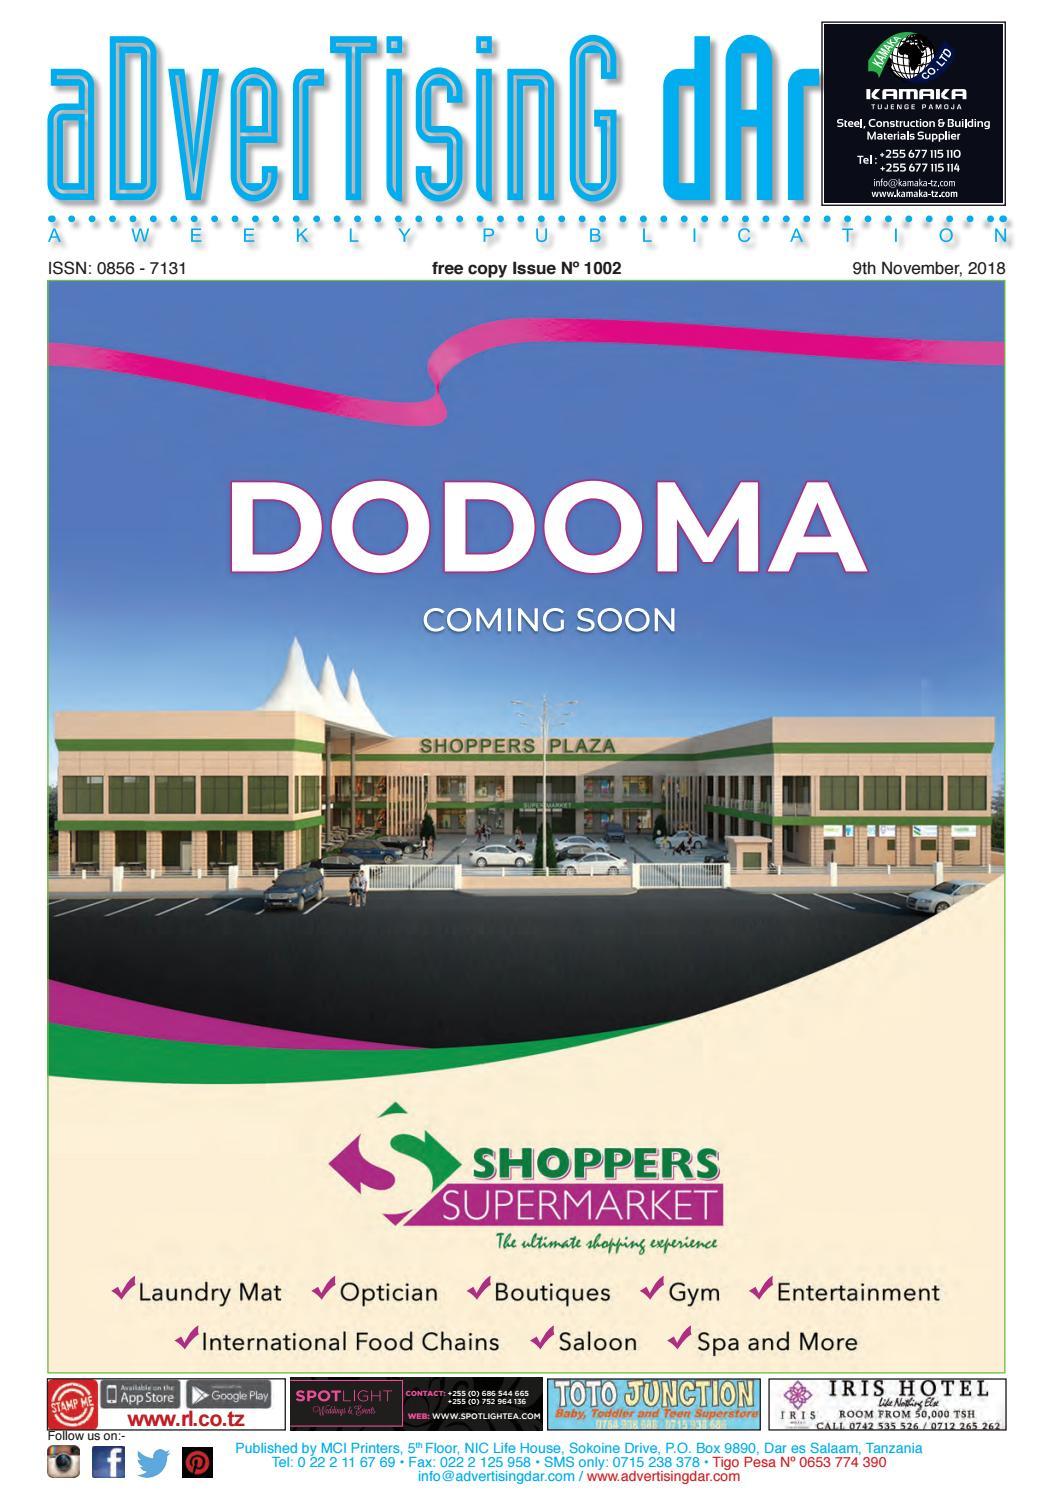 Advertising Dar Issue Nº 1002 - 9th November, 2018 by